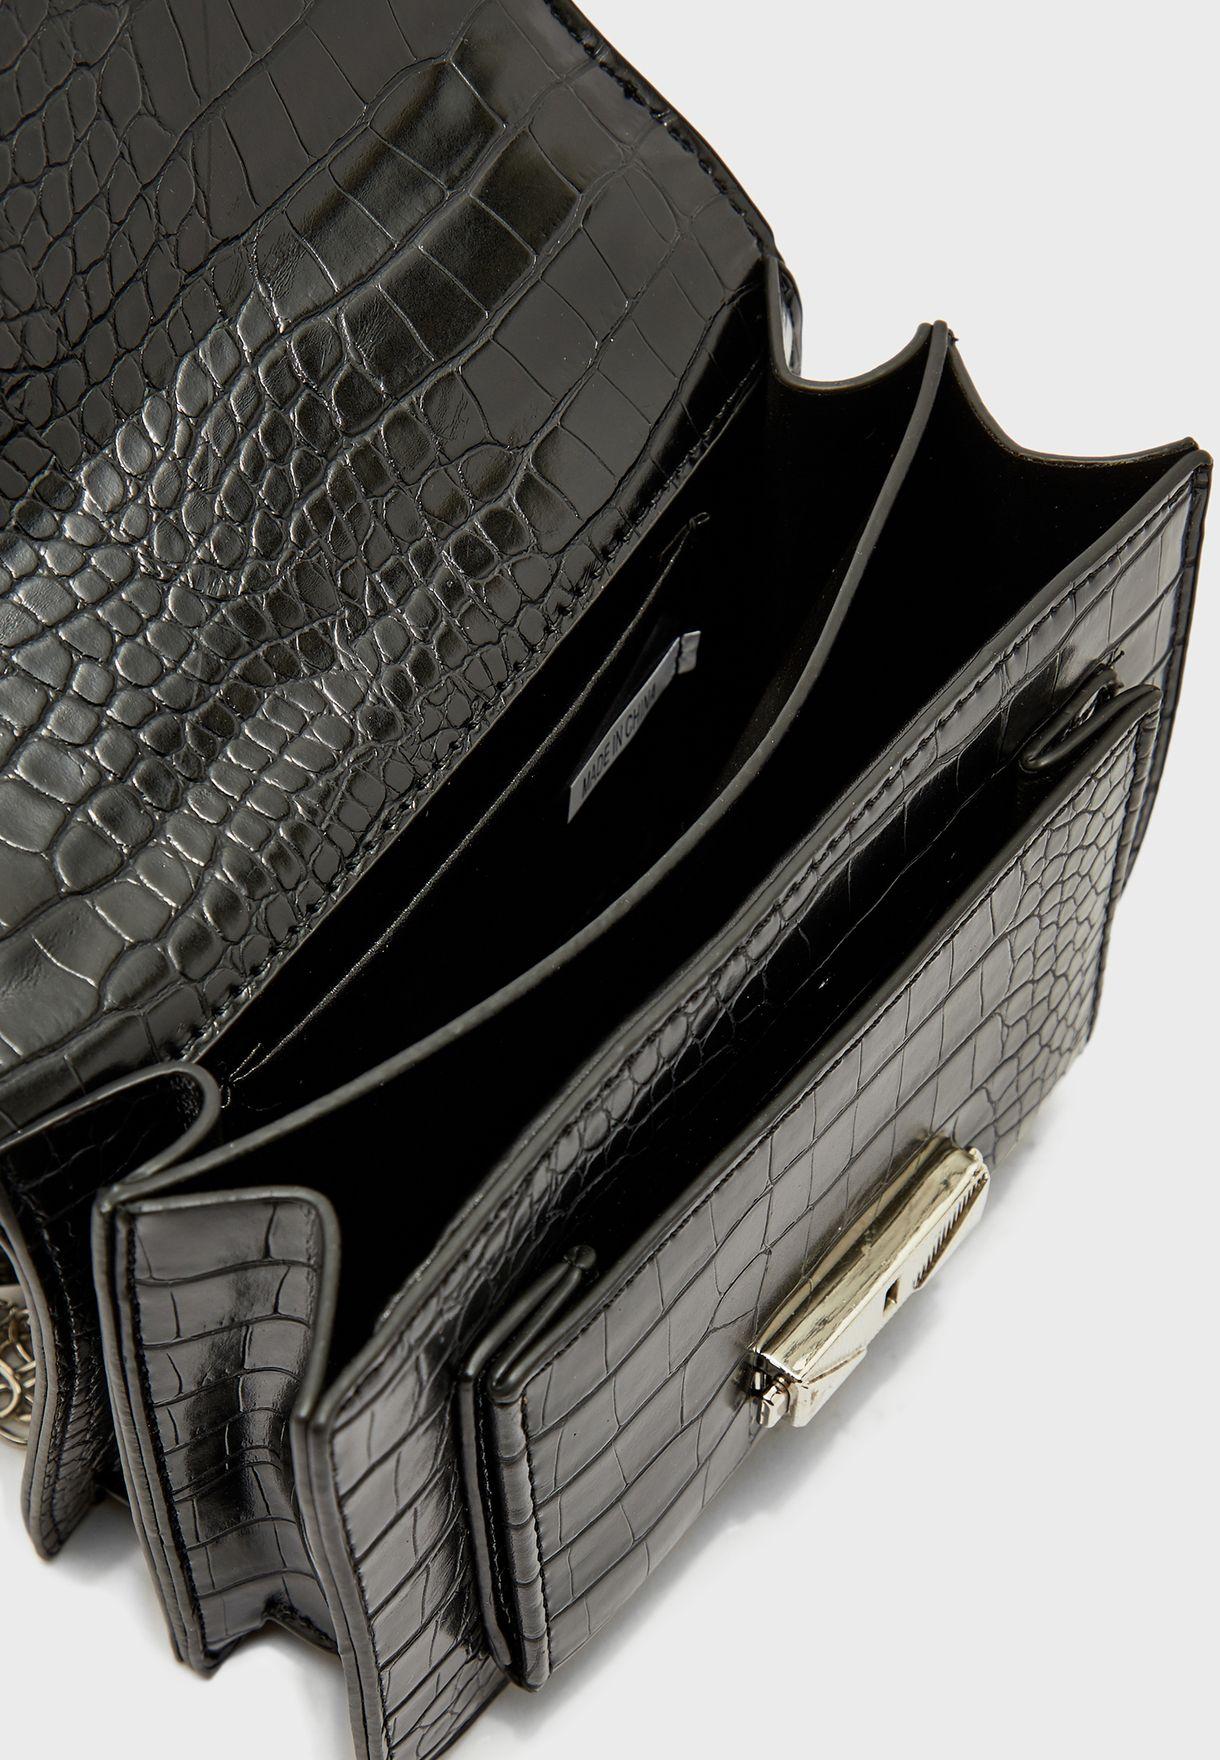 Croc Handbag with Woven Chain Handle